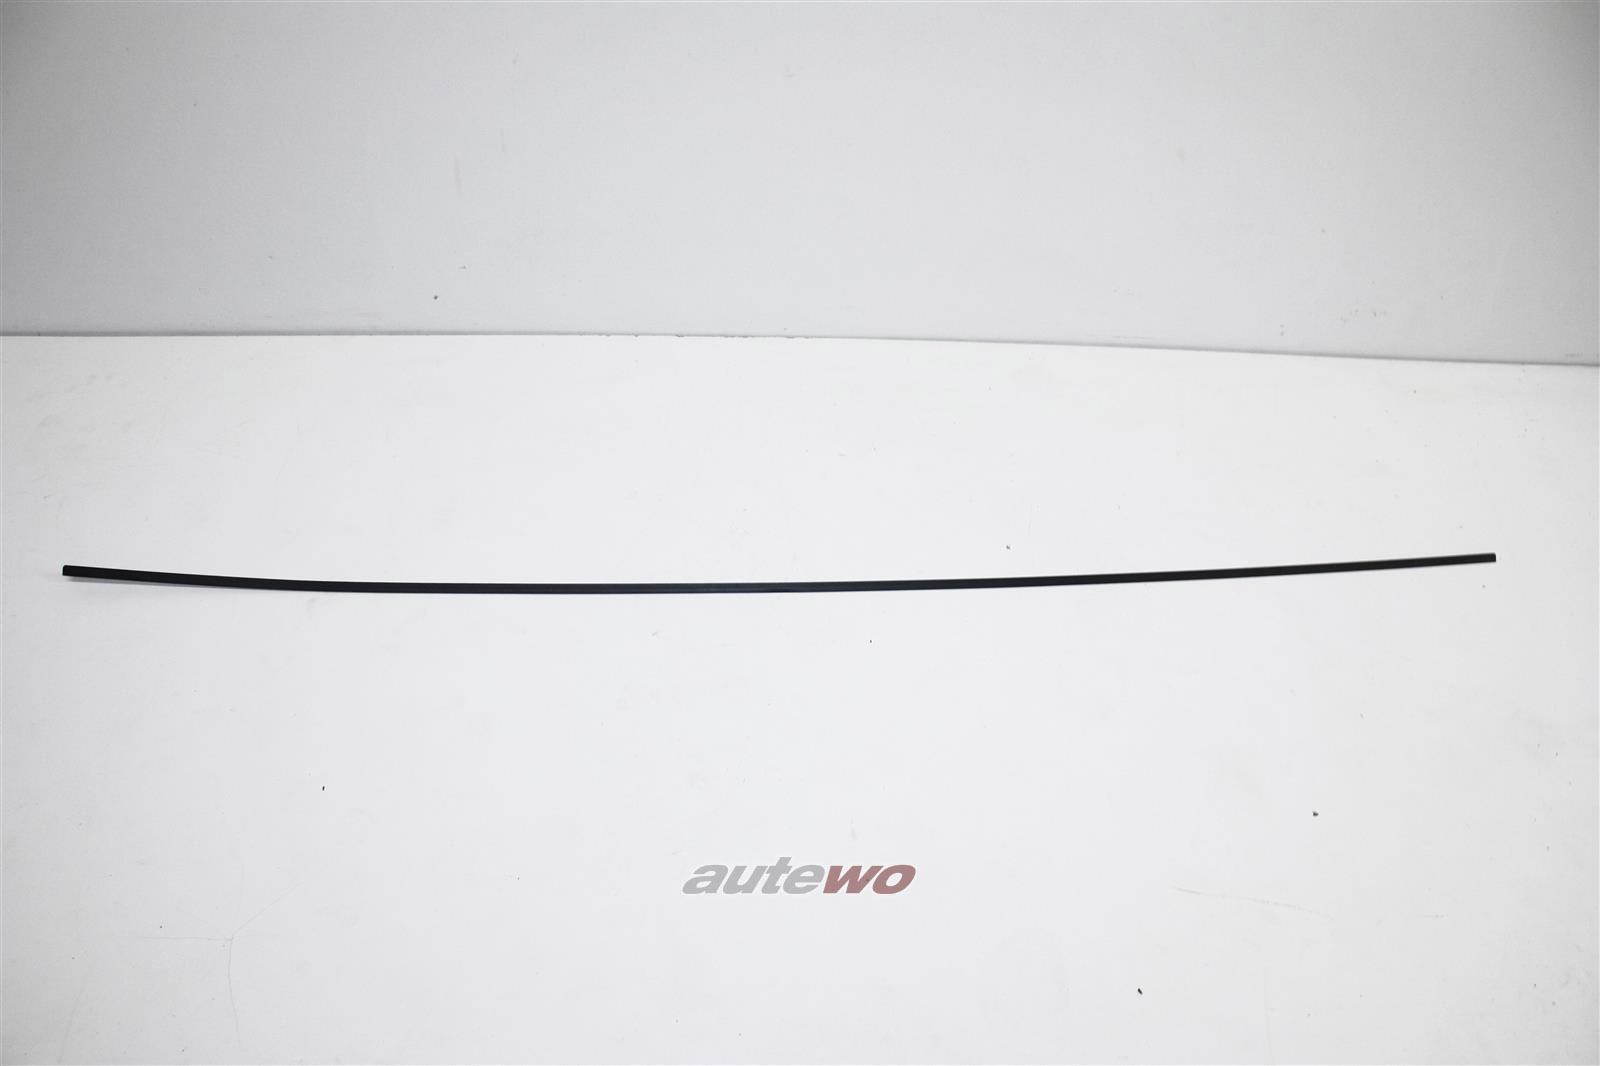 443807669A NEU Audi 100 Typ 44 Orig. Dichtung/Dichtleiste unter Scheinwerfer